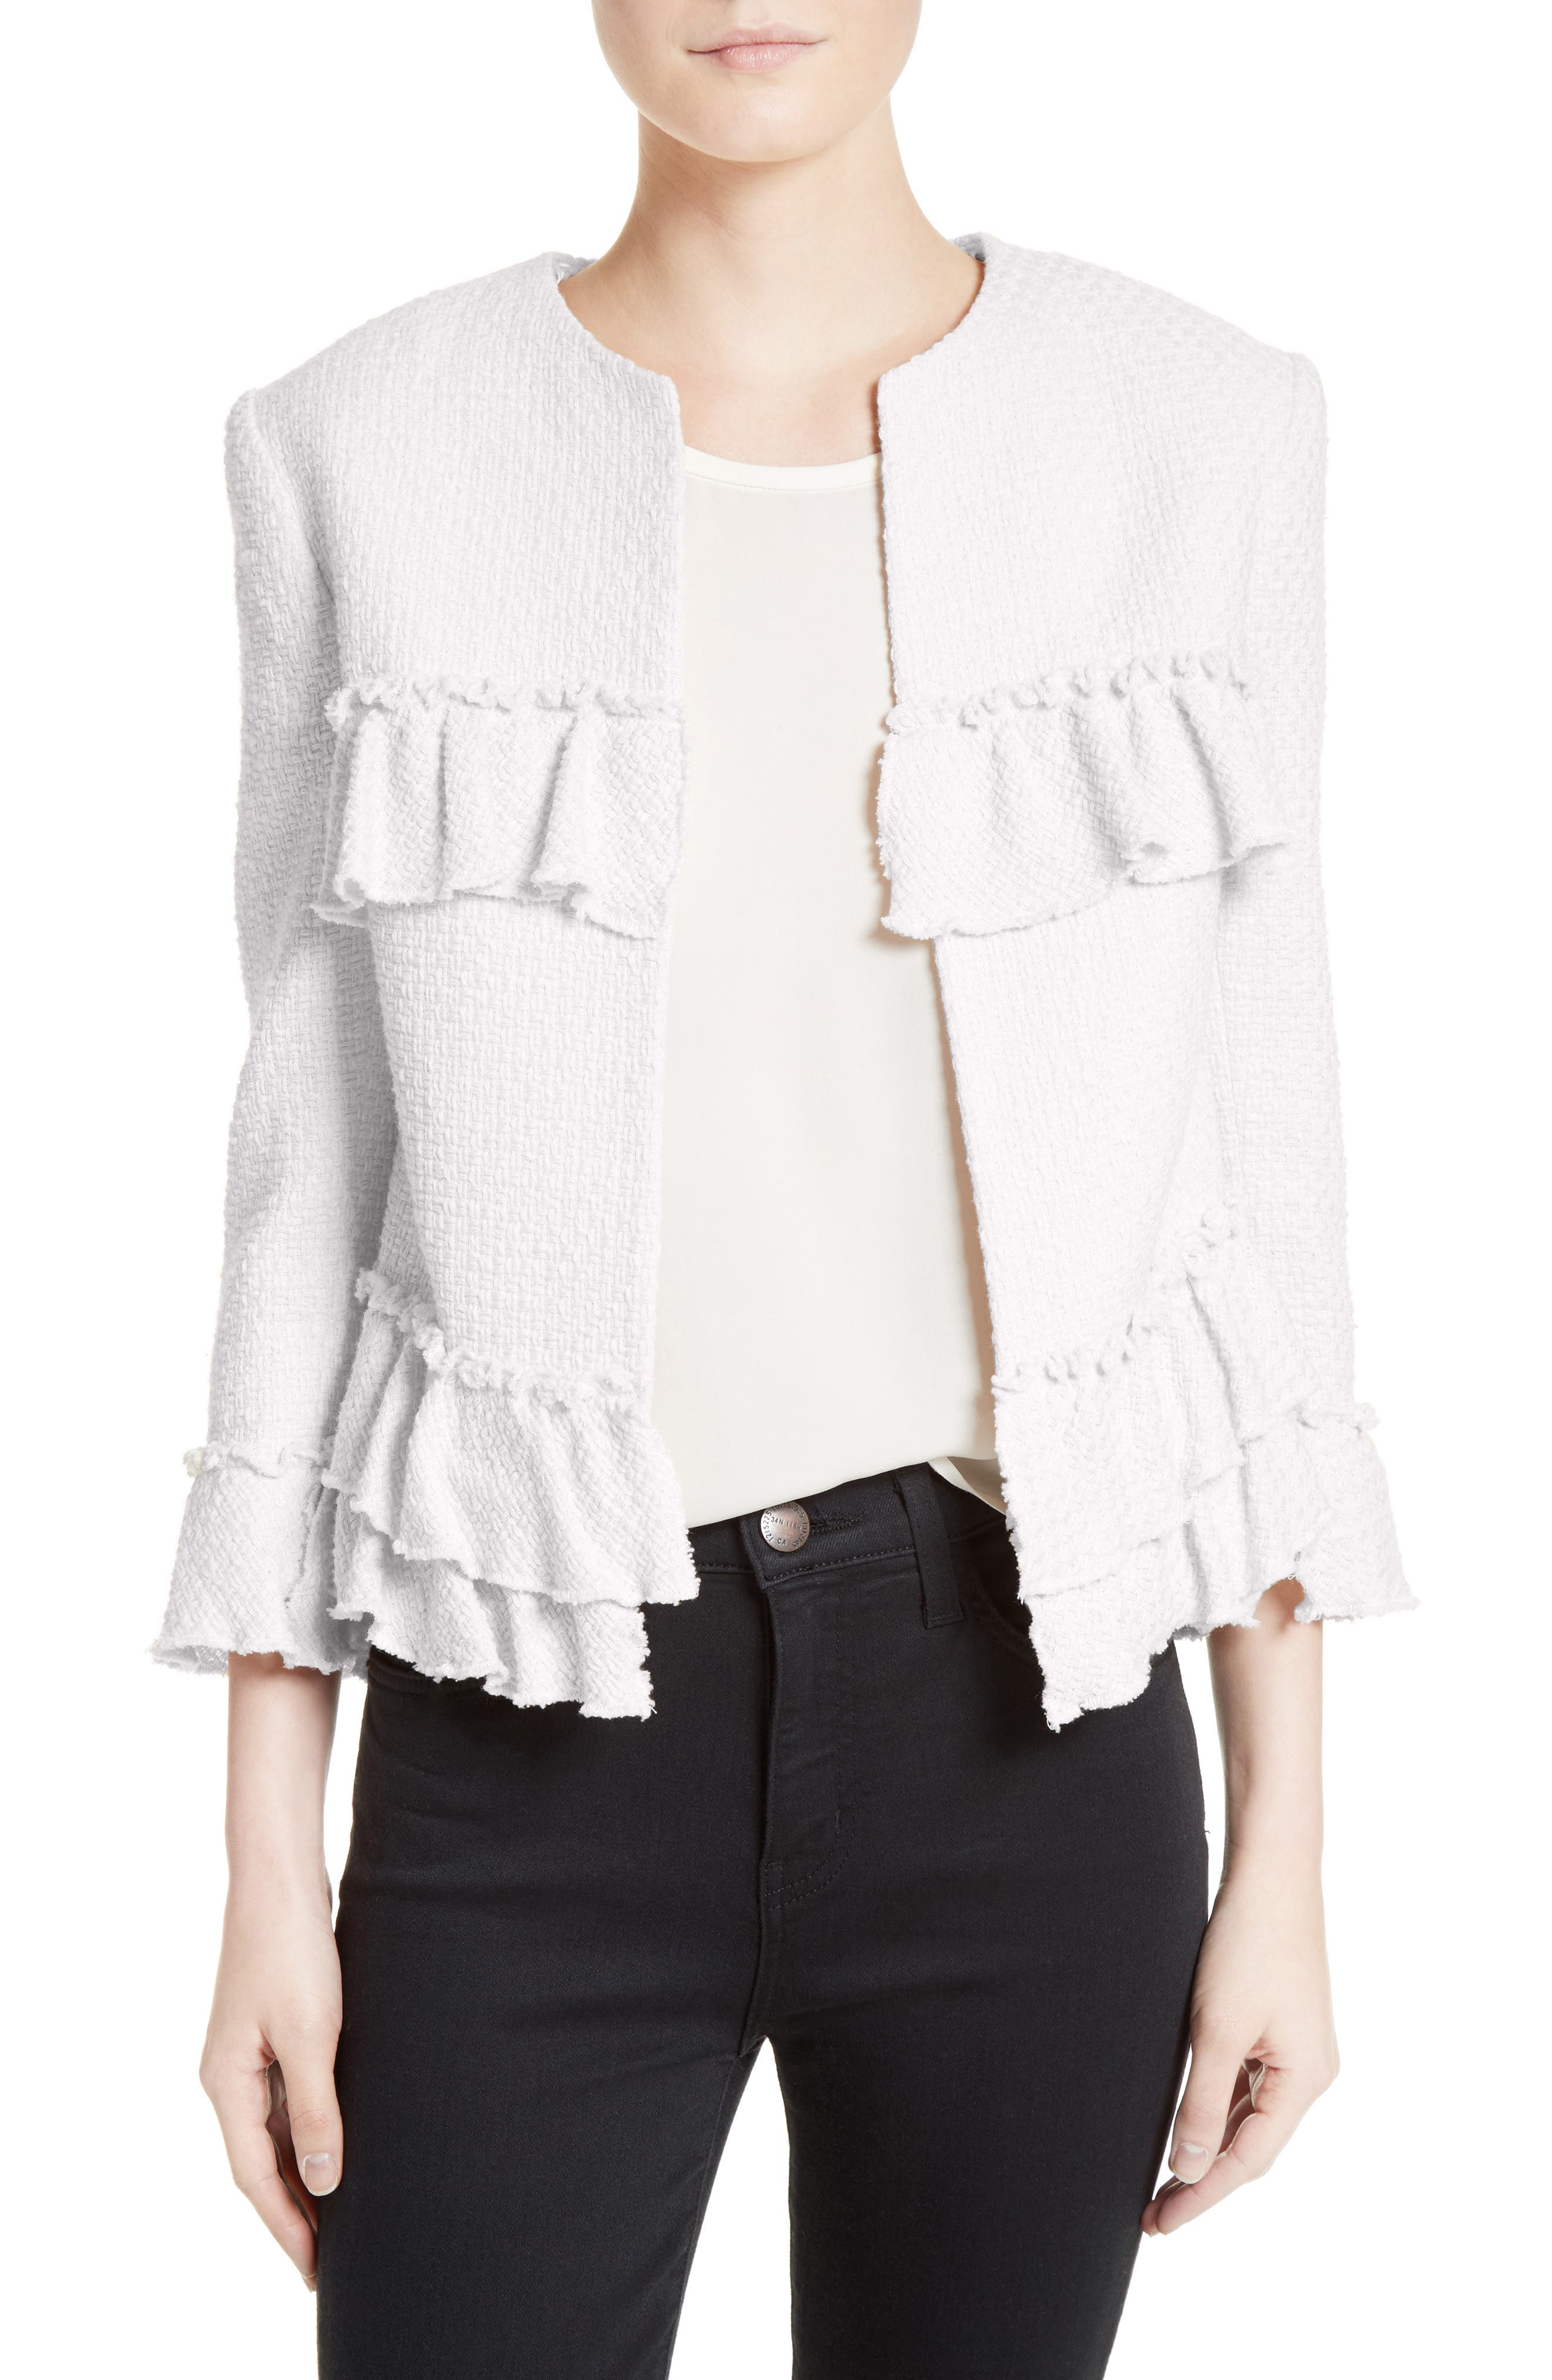 Alternate Image 1 Selected - Helene Berman Frill Tweed Jacket